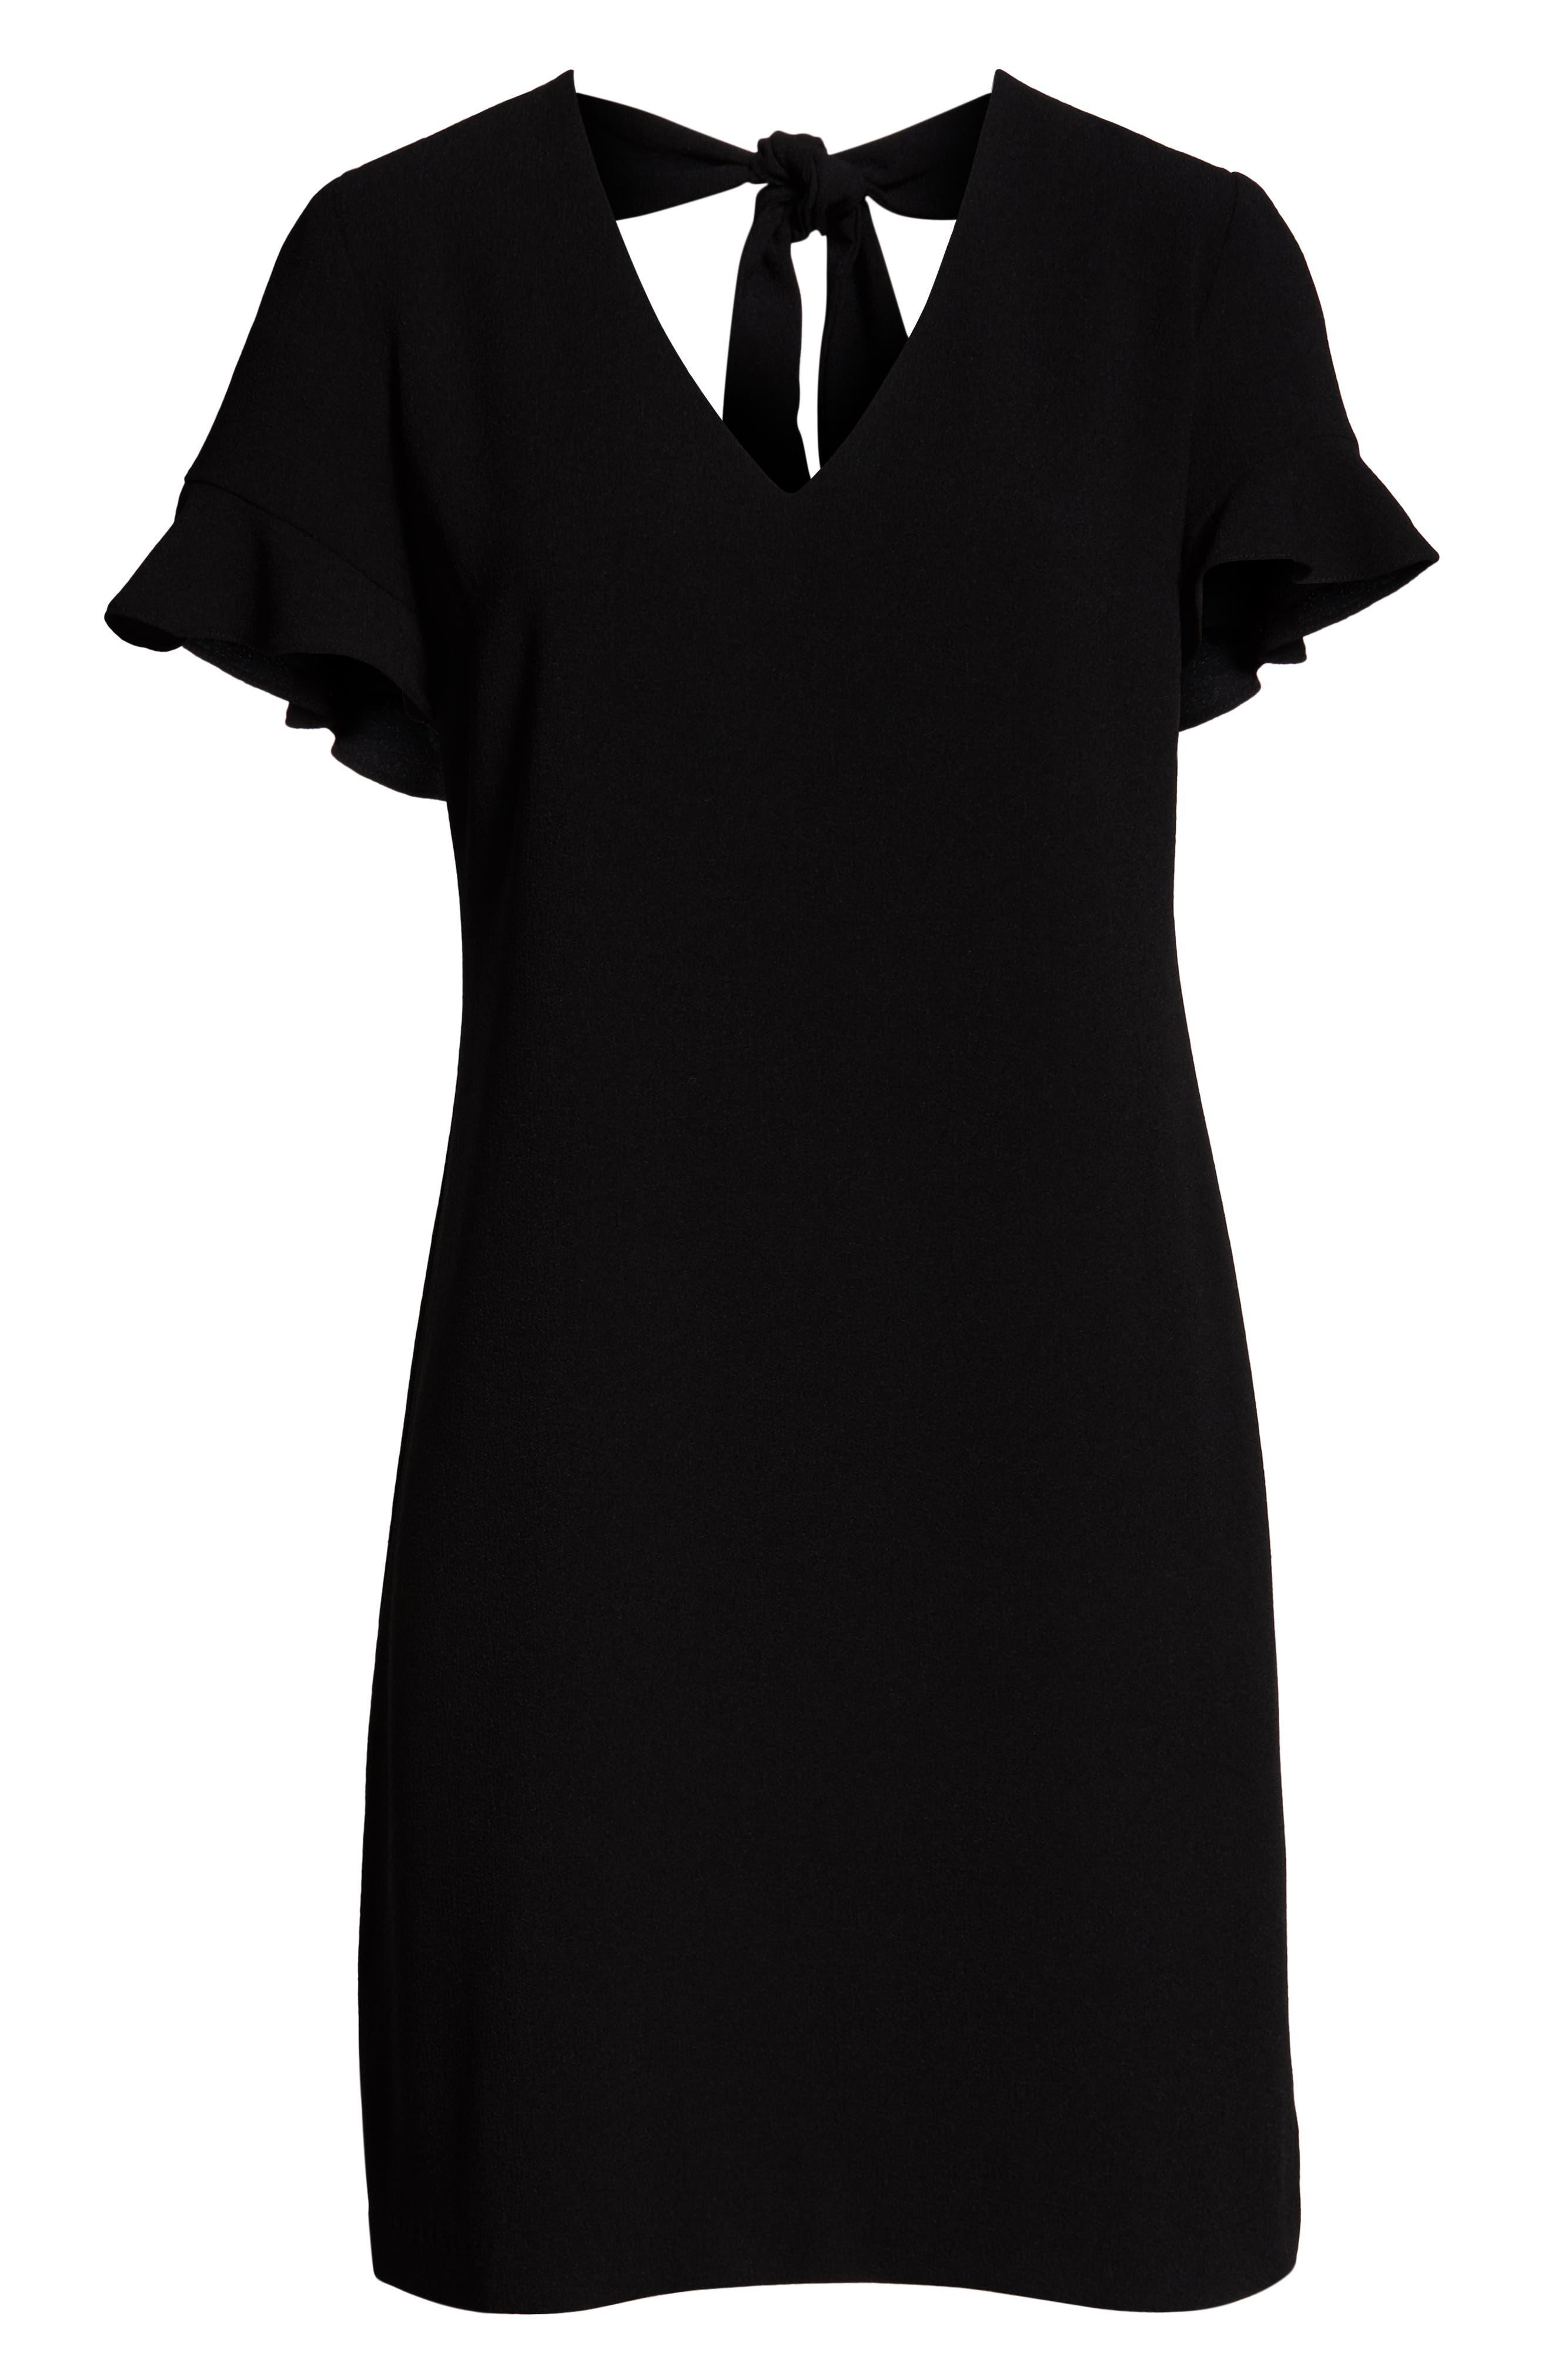 CHARLES HENRY, Tie Back Shift Dress, Alternate thumbnail 7, color, BLACK